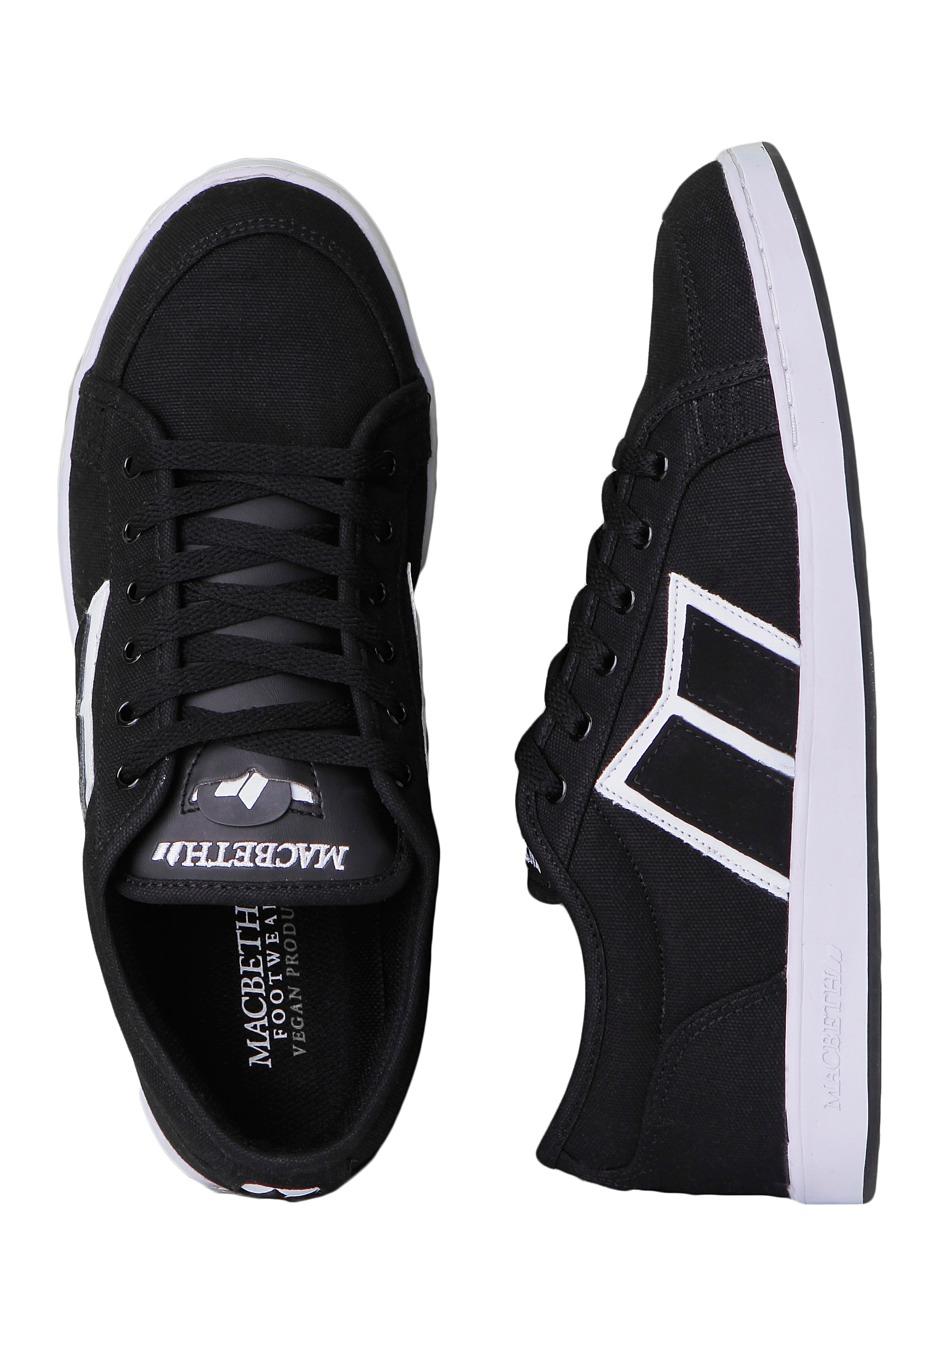 macbeth emerson black white shoes impericon